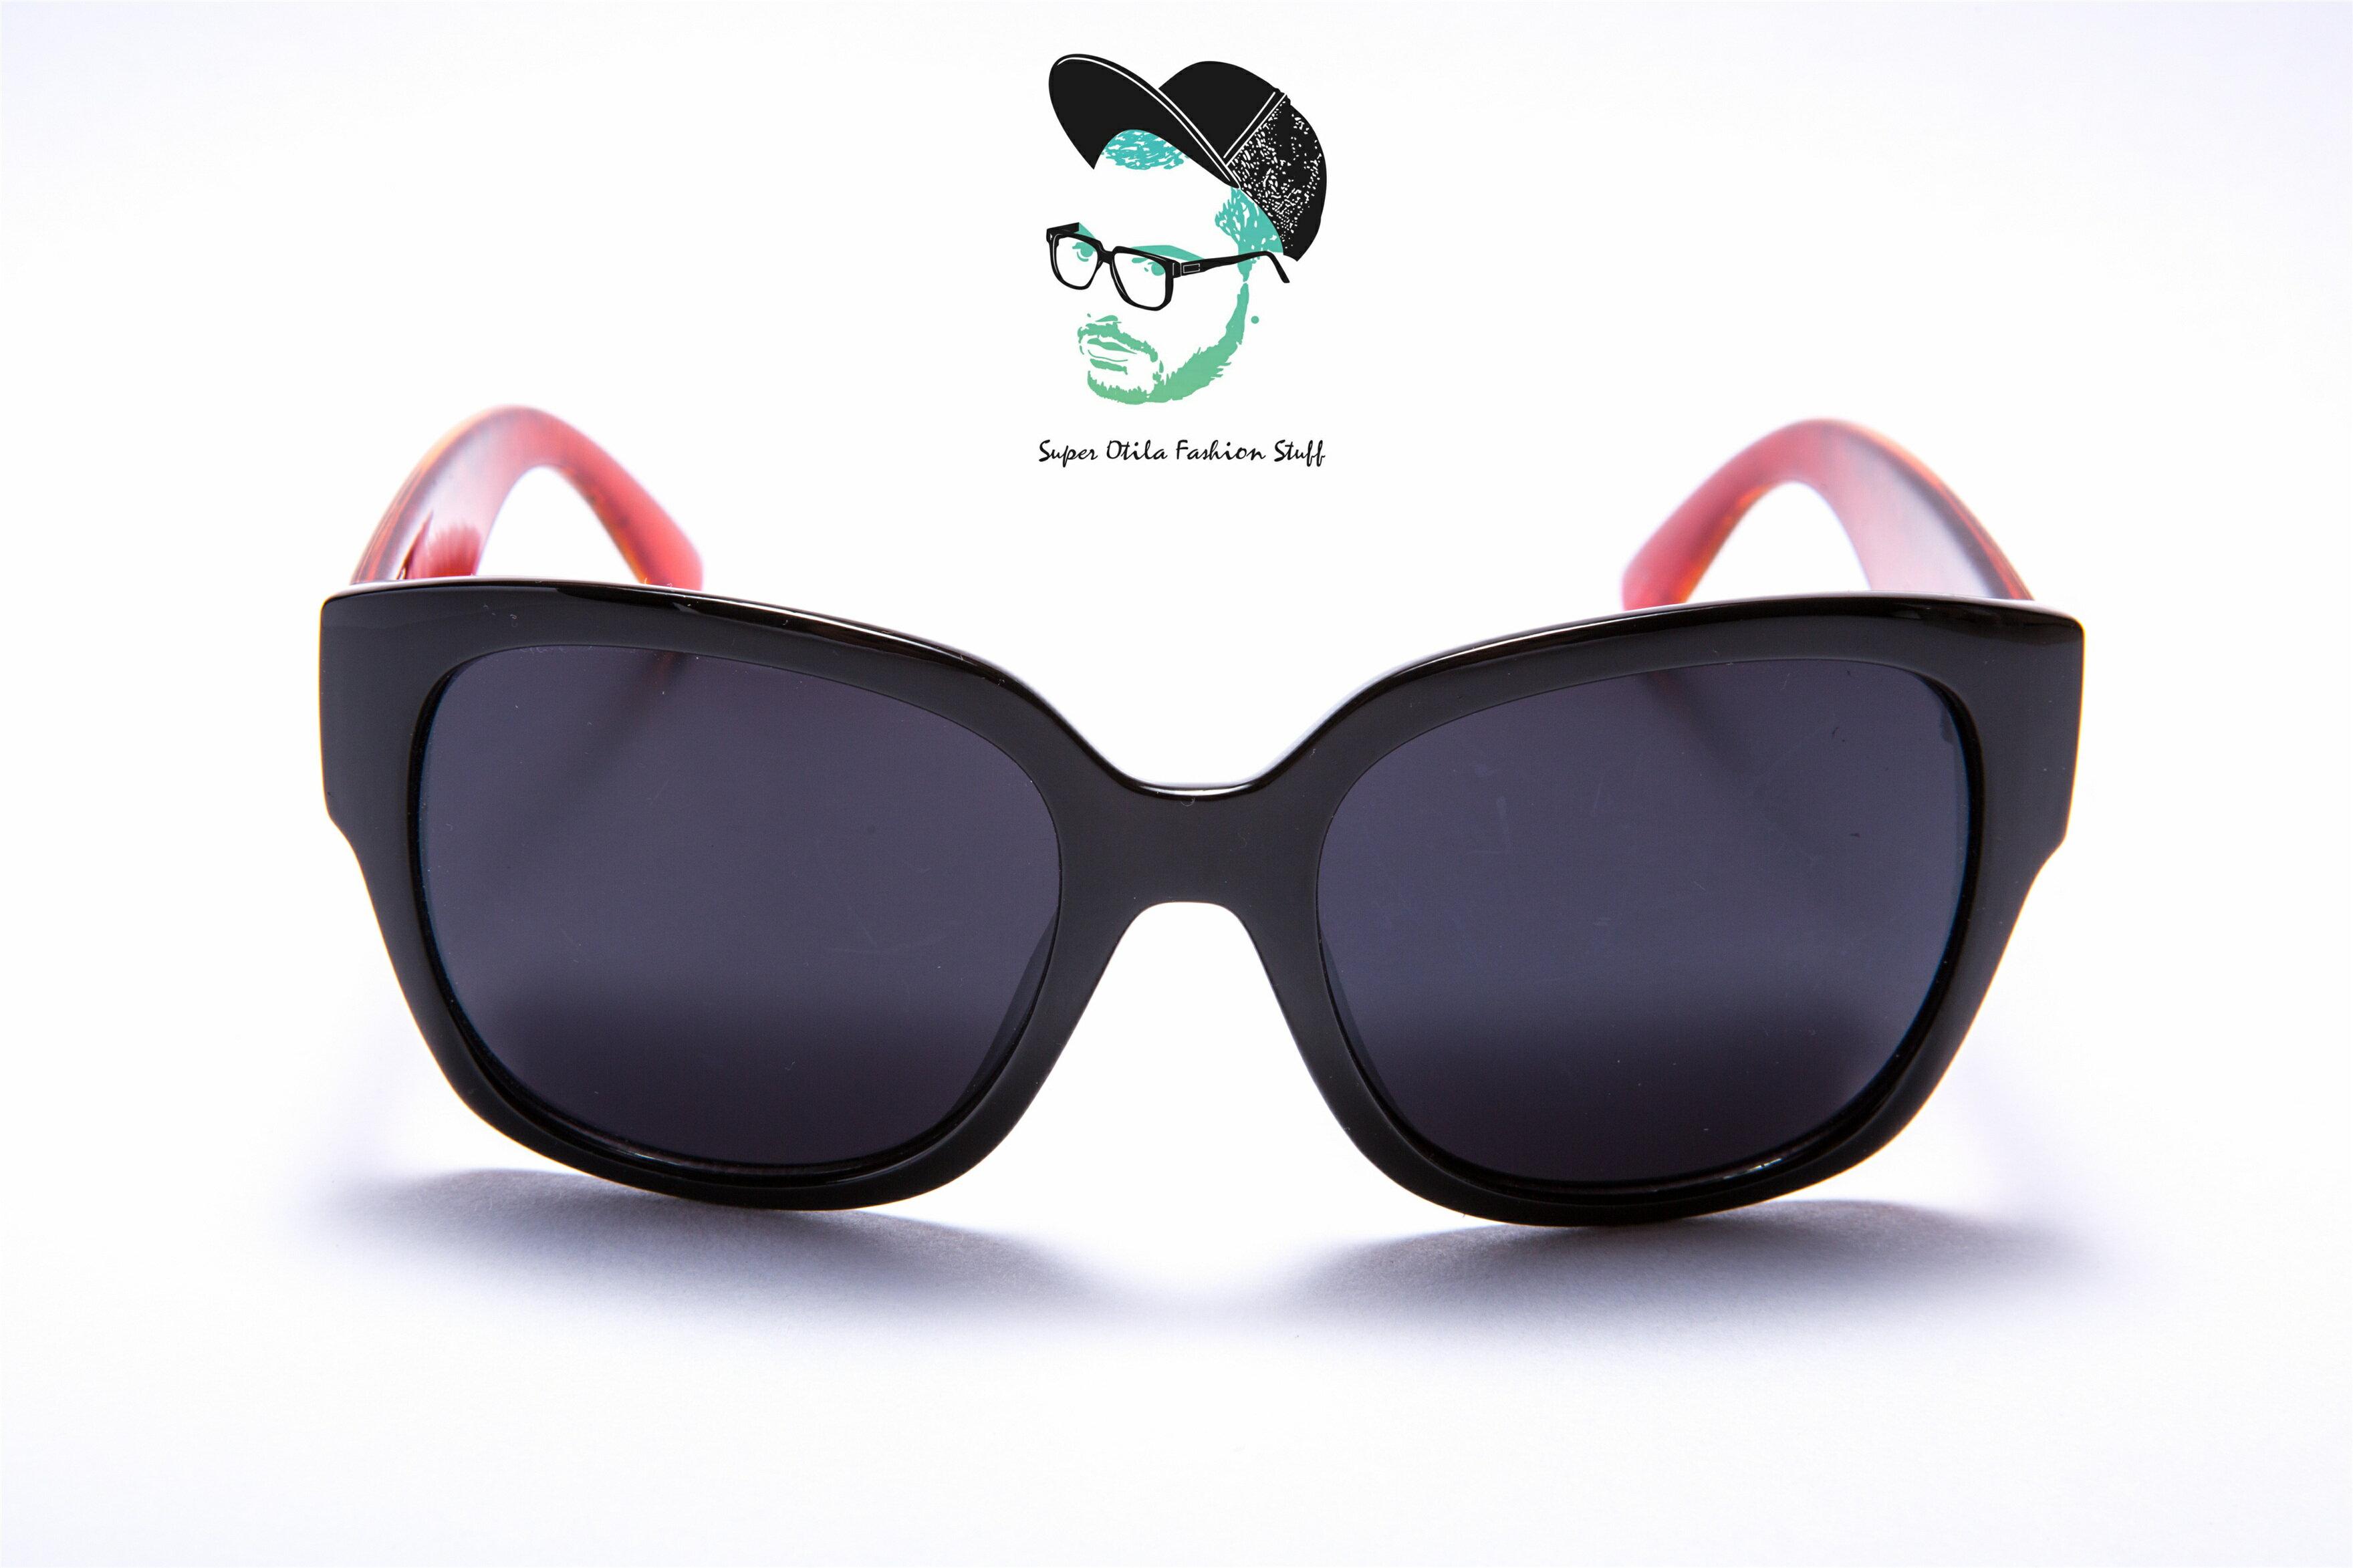 glasses for lovers 太陽眼鏡 墨鏡 眼鏡  韓國  【2051】超強撞色墨鏡